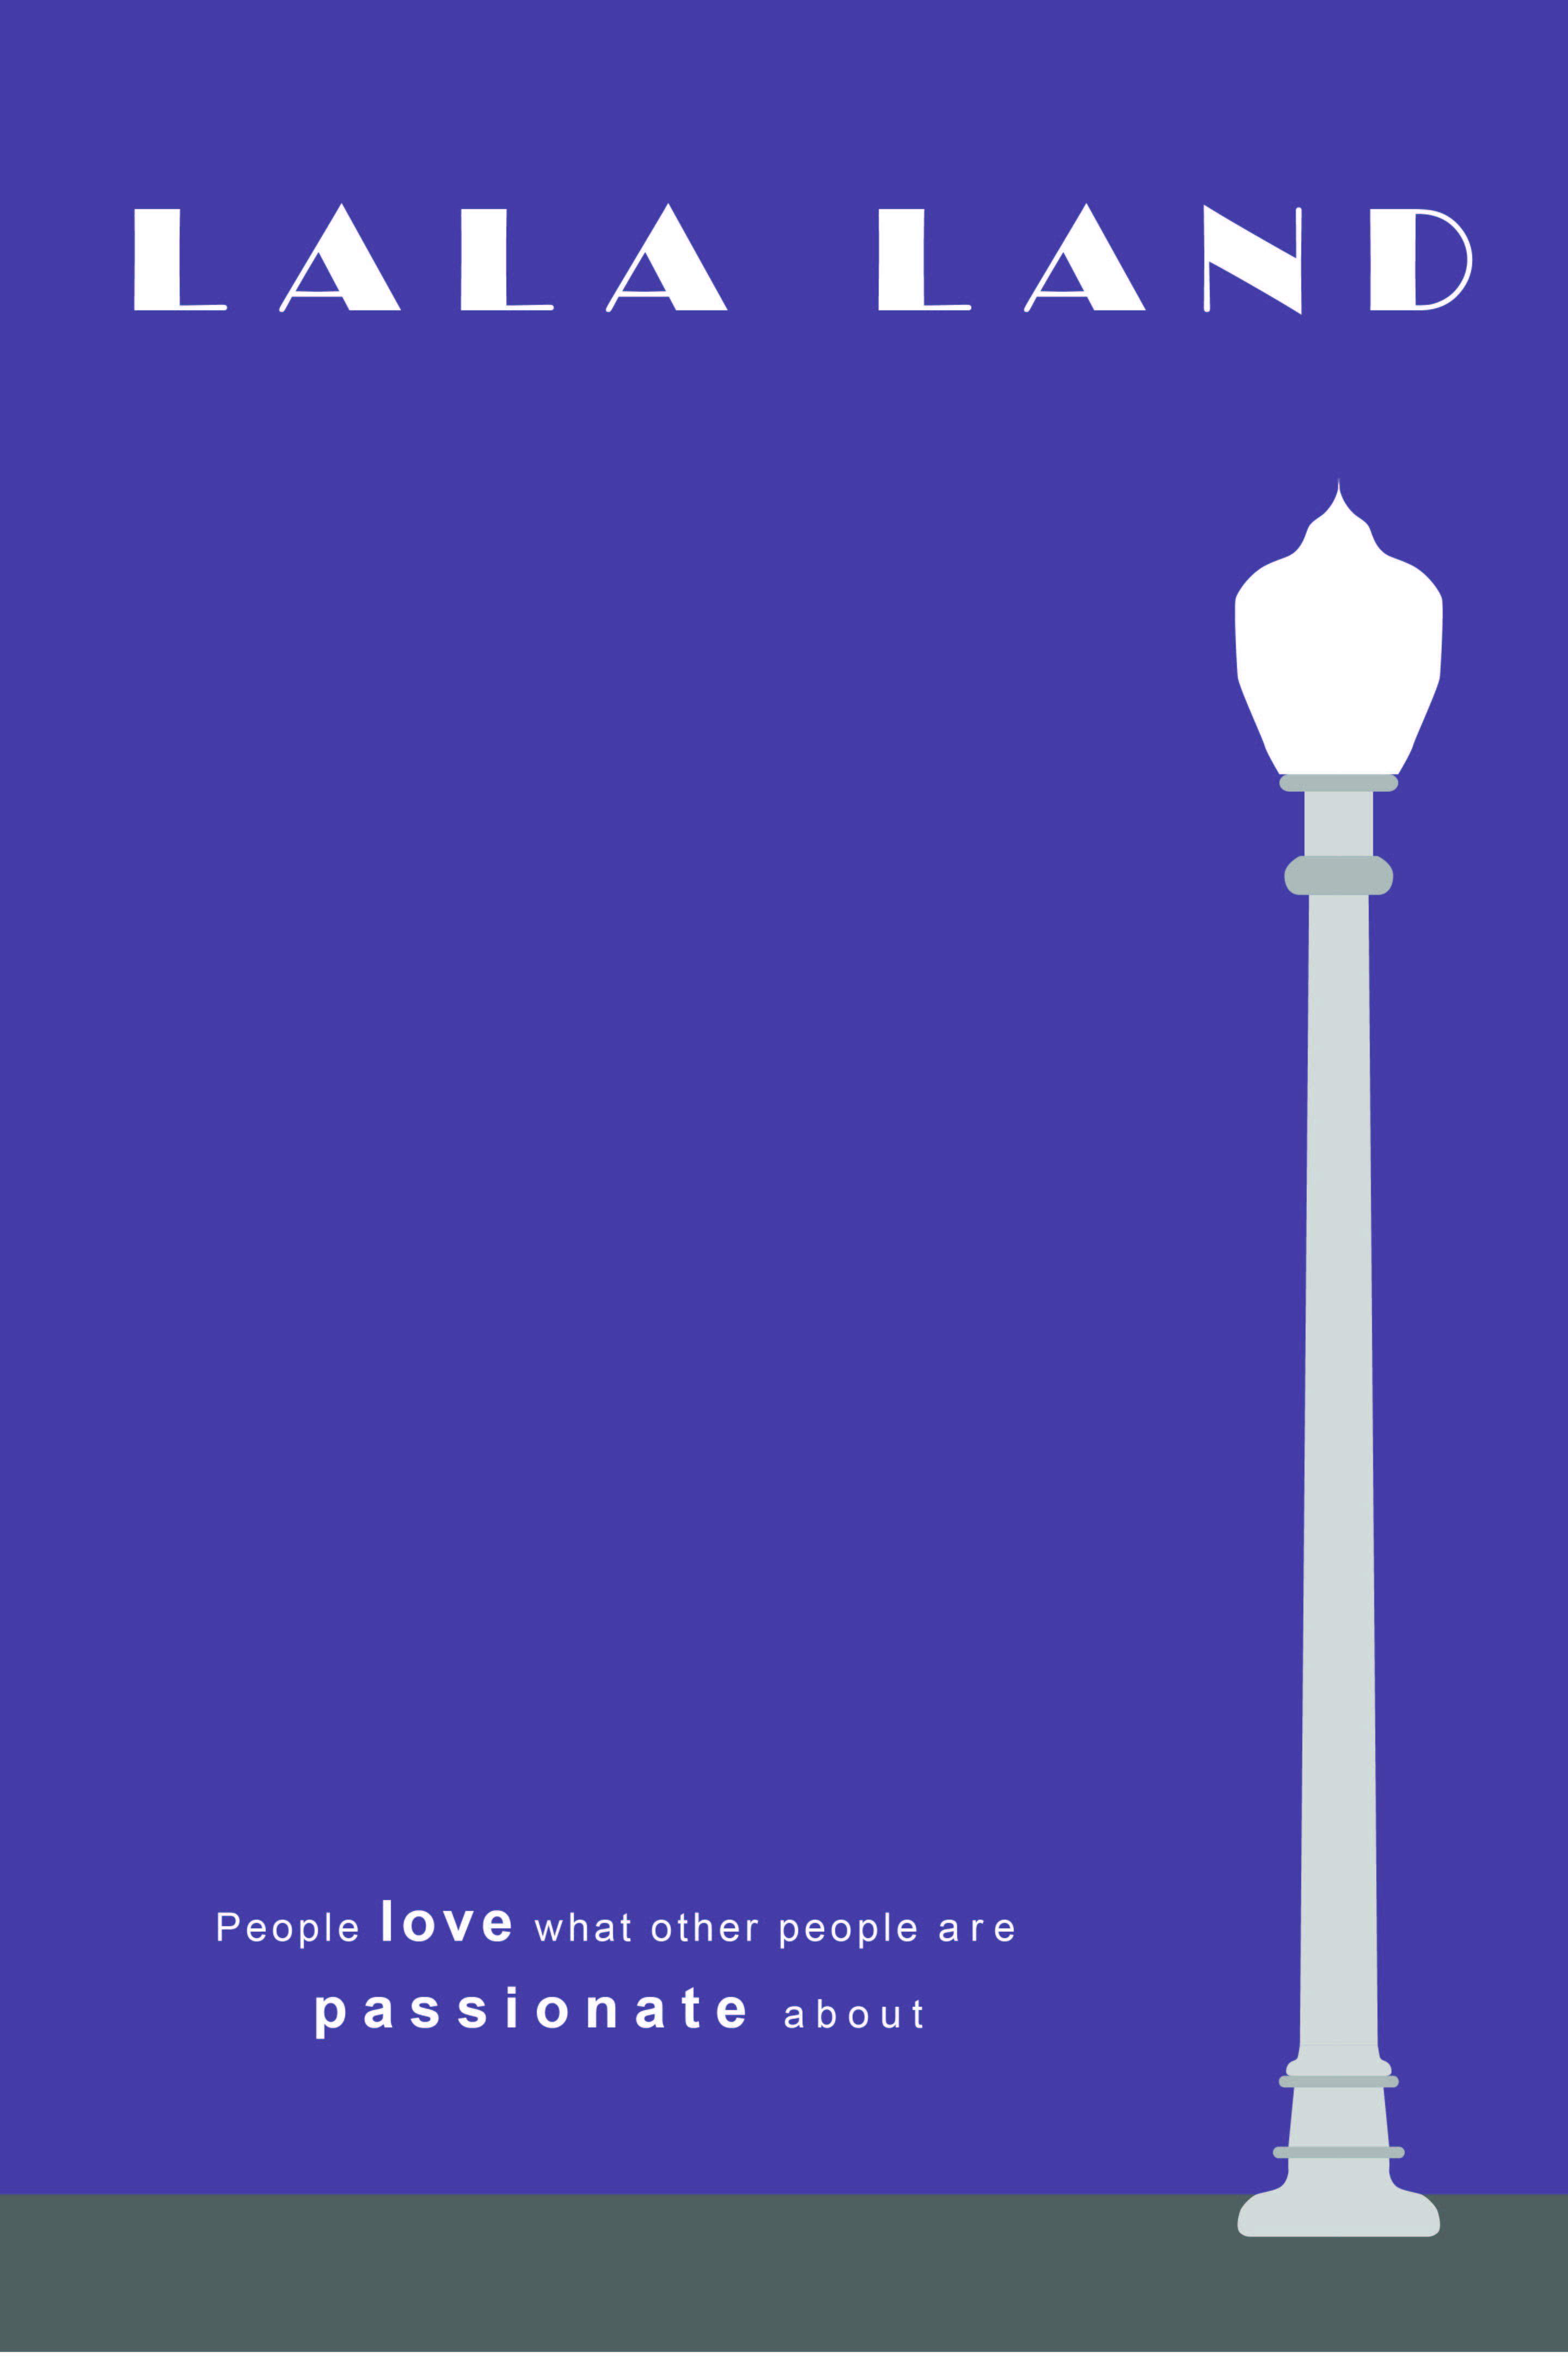 Lala Land 2016 Movie Minimalist Poster In 2019 La La Land